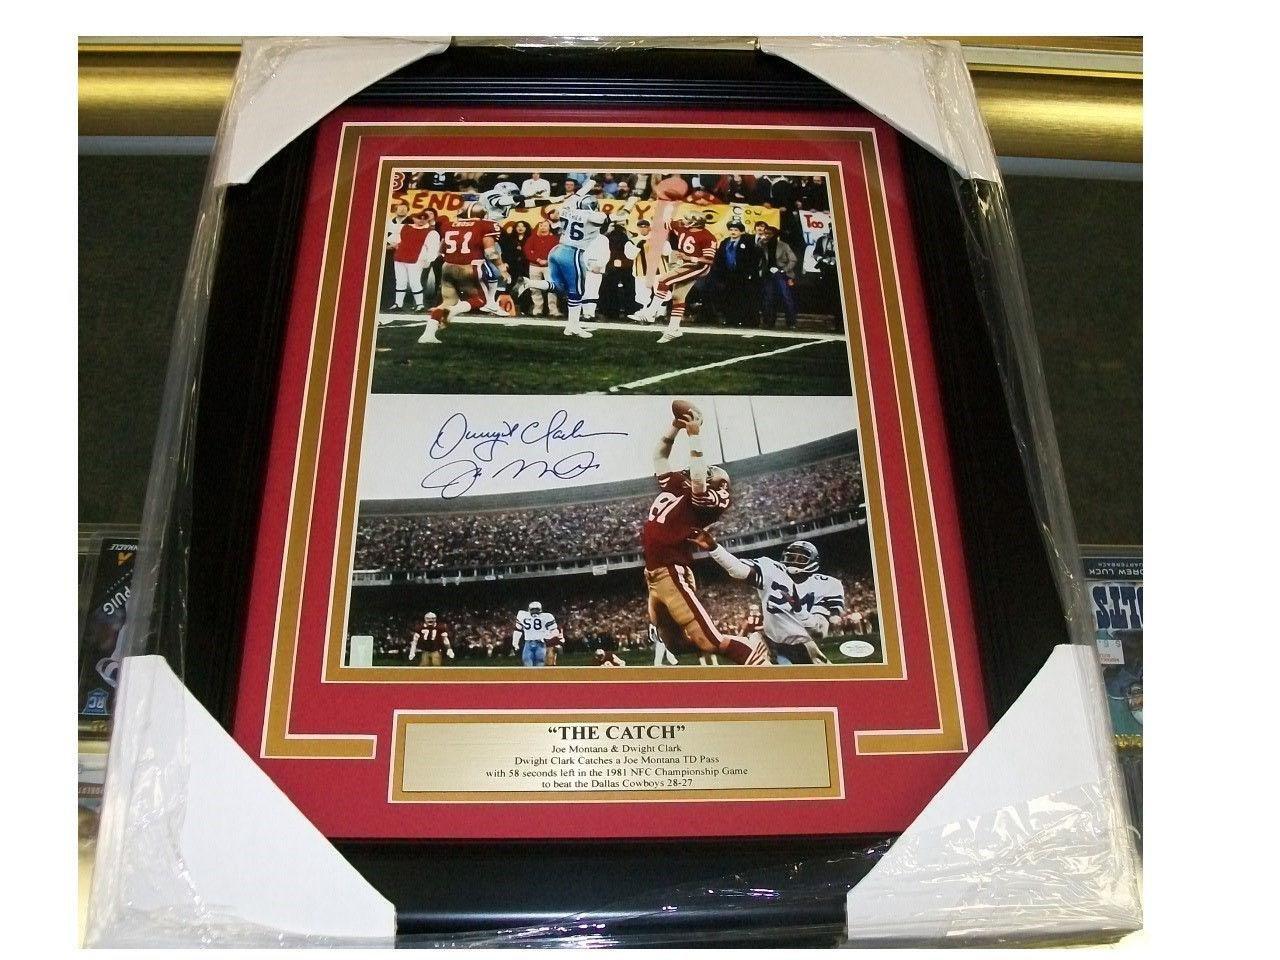 Joe Montana Dwight Clark The Catch Autographed Reprint Framed 8x10 Photo 49'ers Autographed NFL Photos